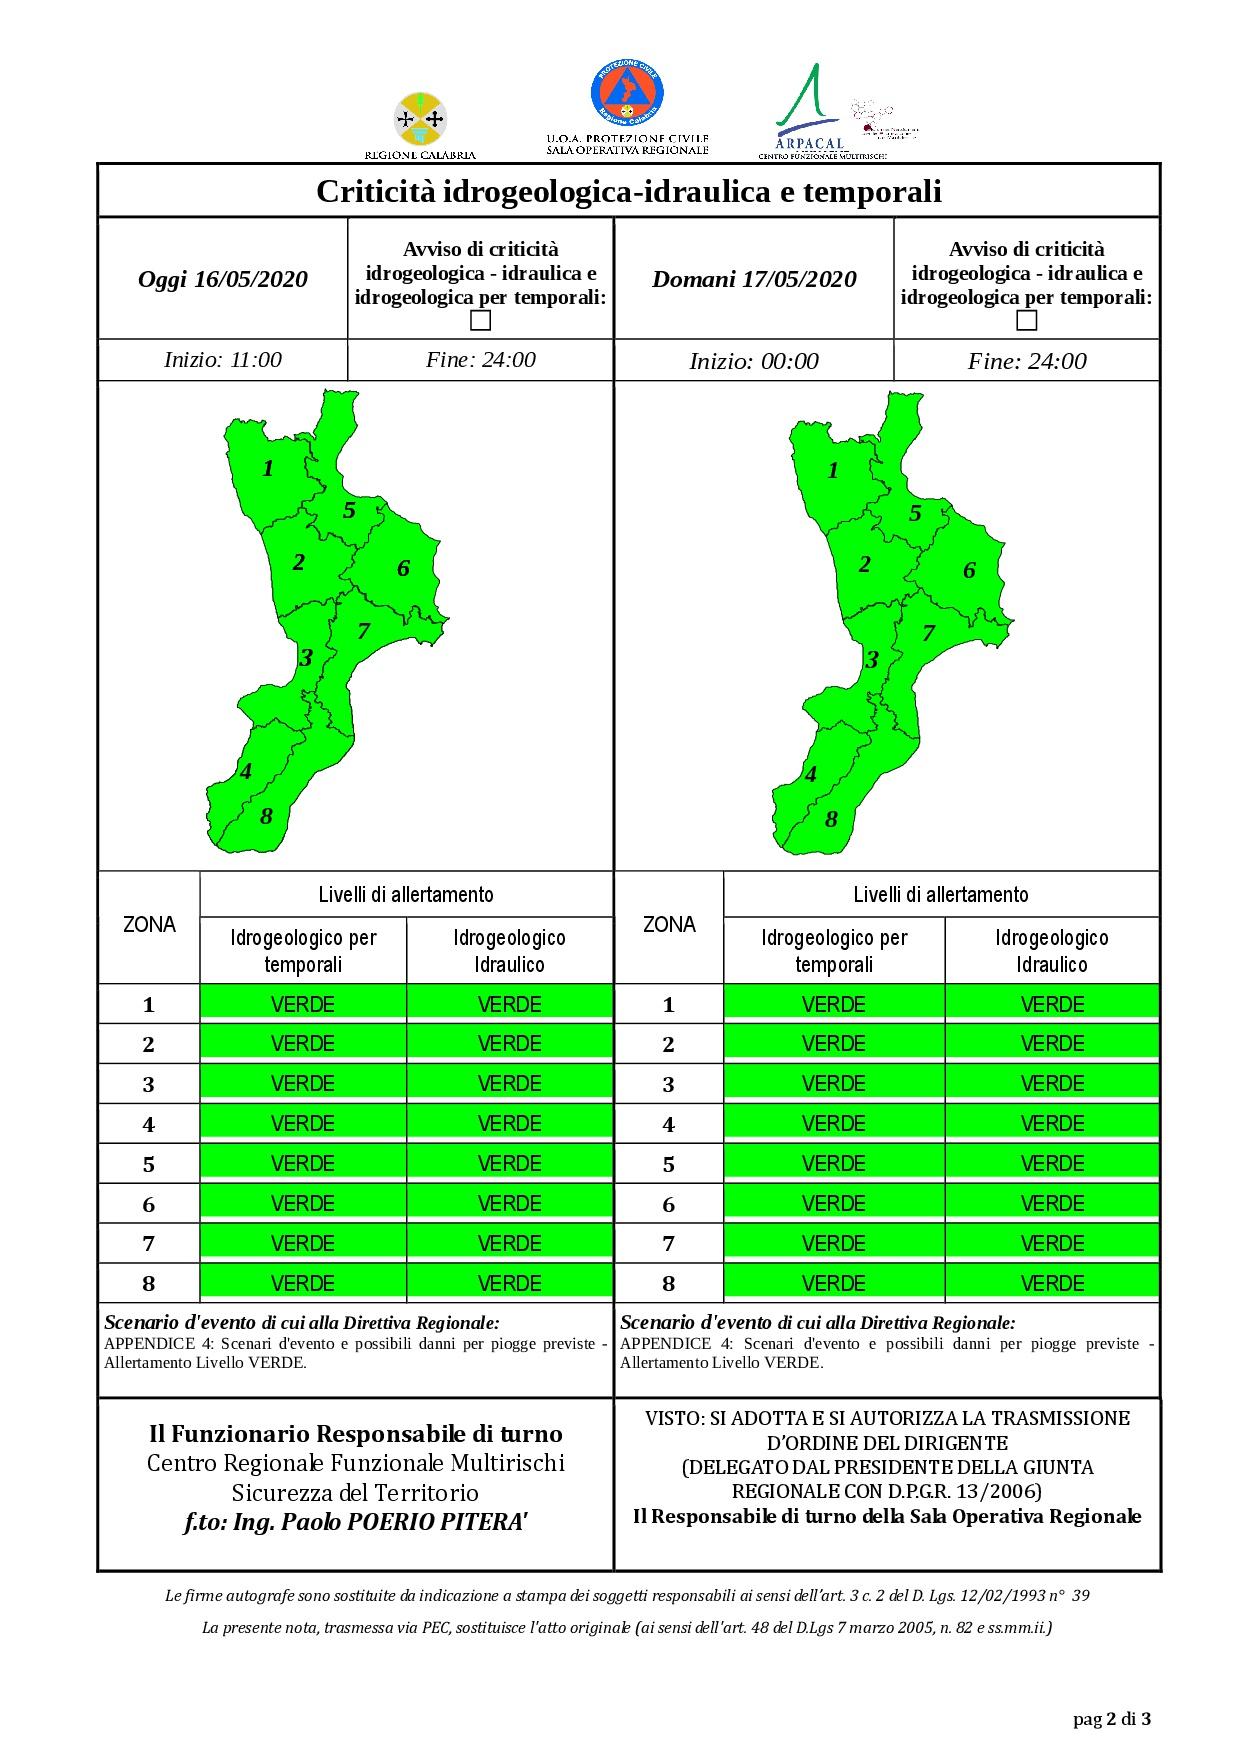 Criticità idrogeologica-idraulica e temporali in Calabria 16-05-2020